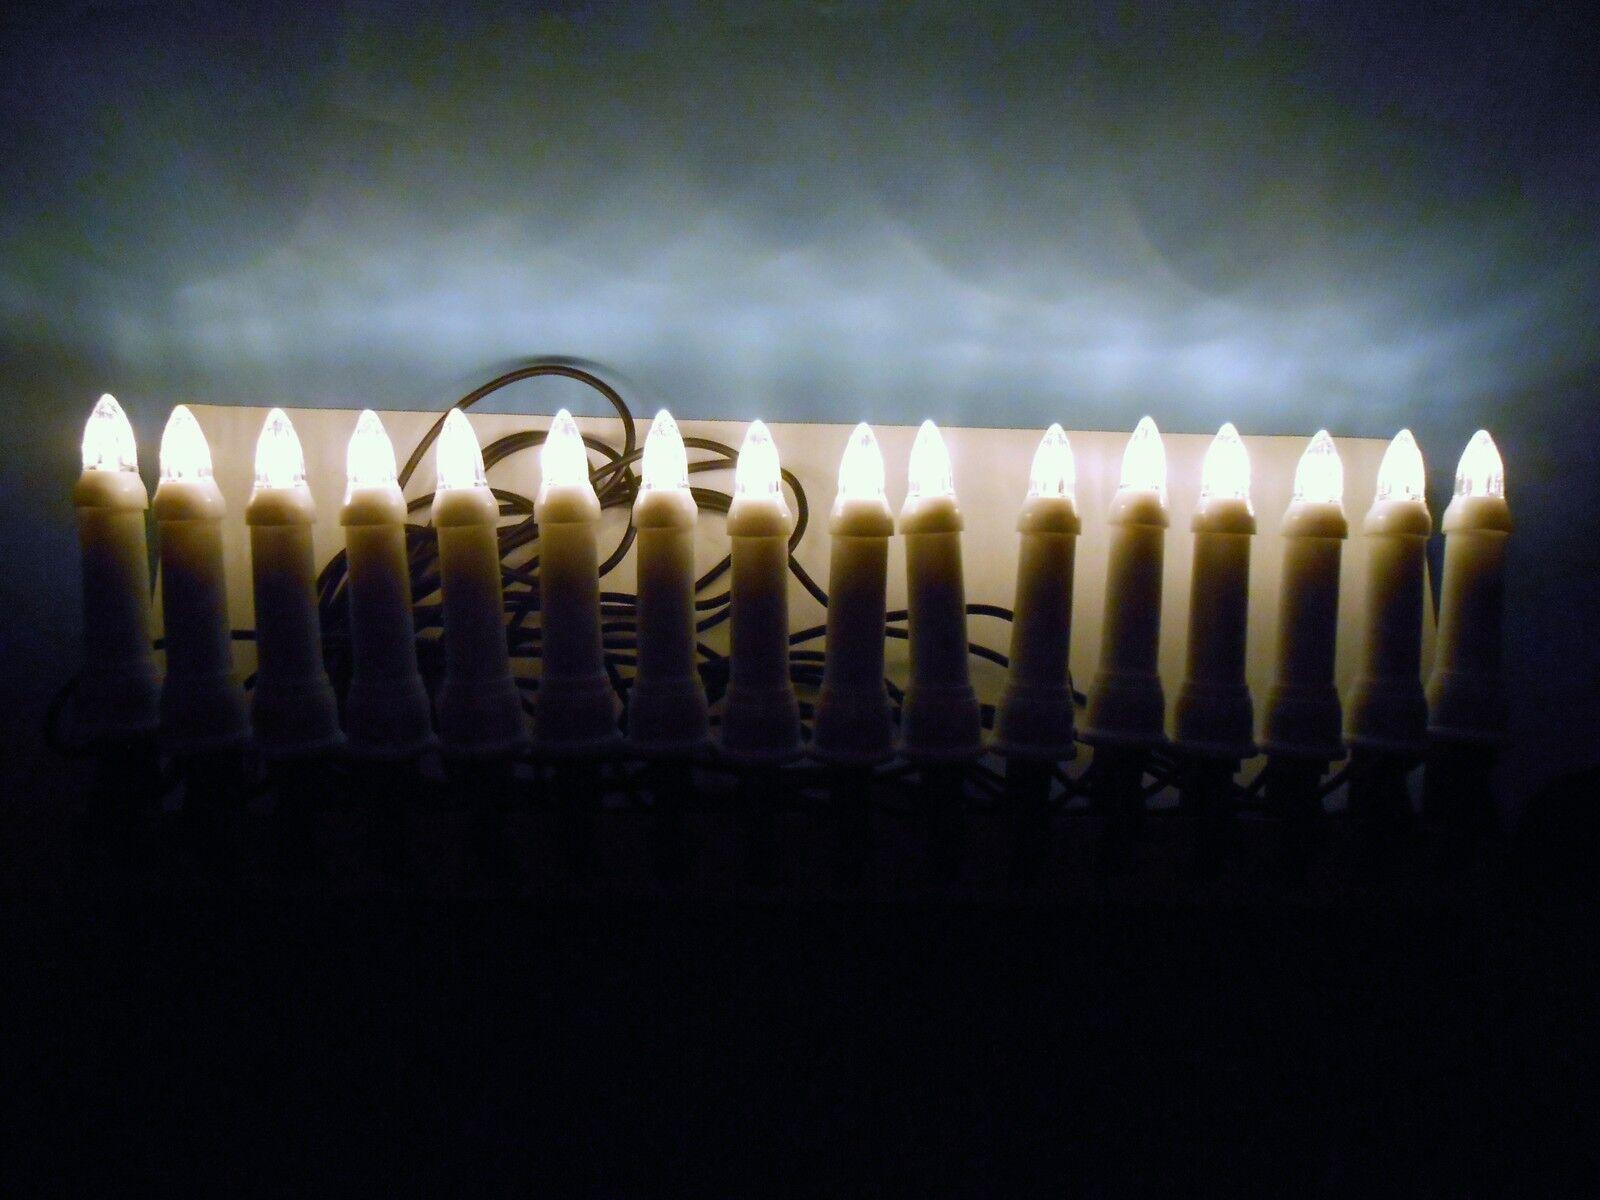 16 er led weihnachtsbaum beleuchtung baumkerzen innen. Black Bedroom Furniture Sets. Home Design Ideas